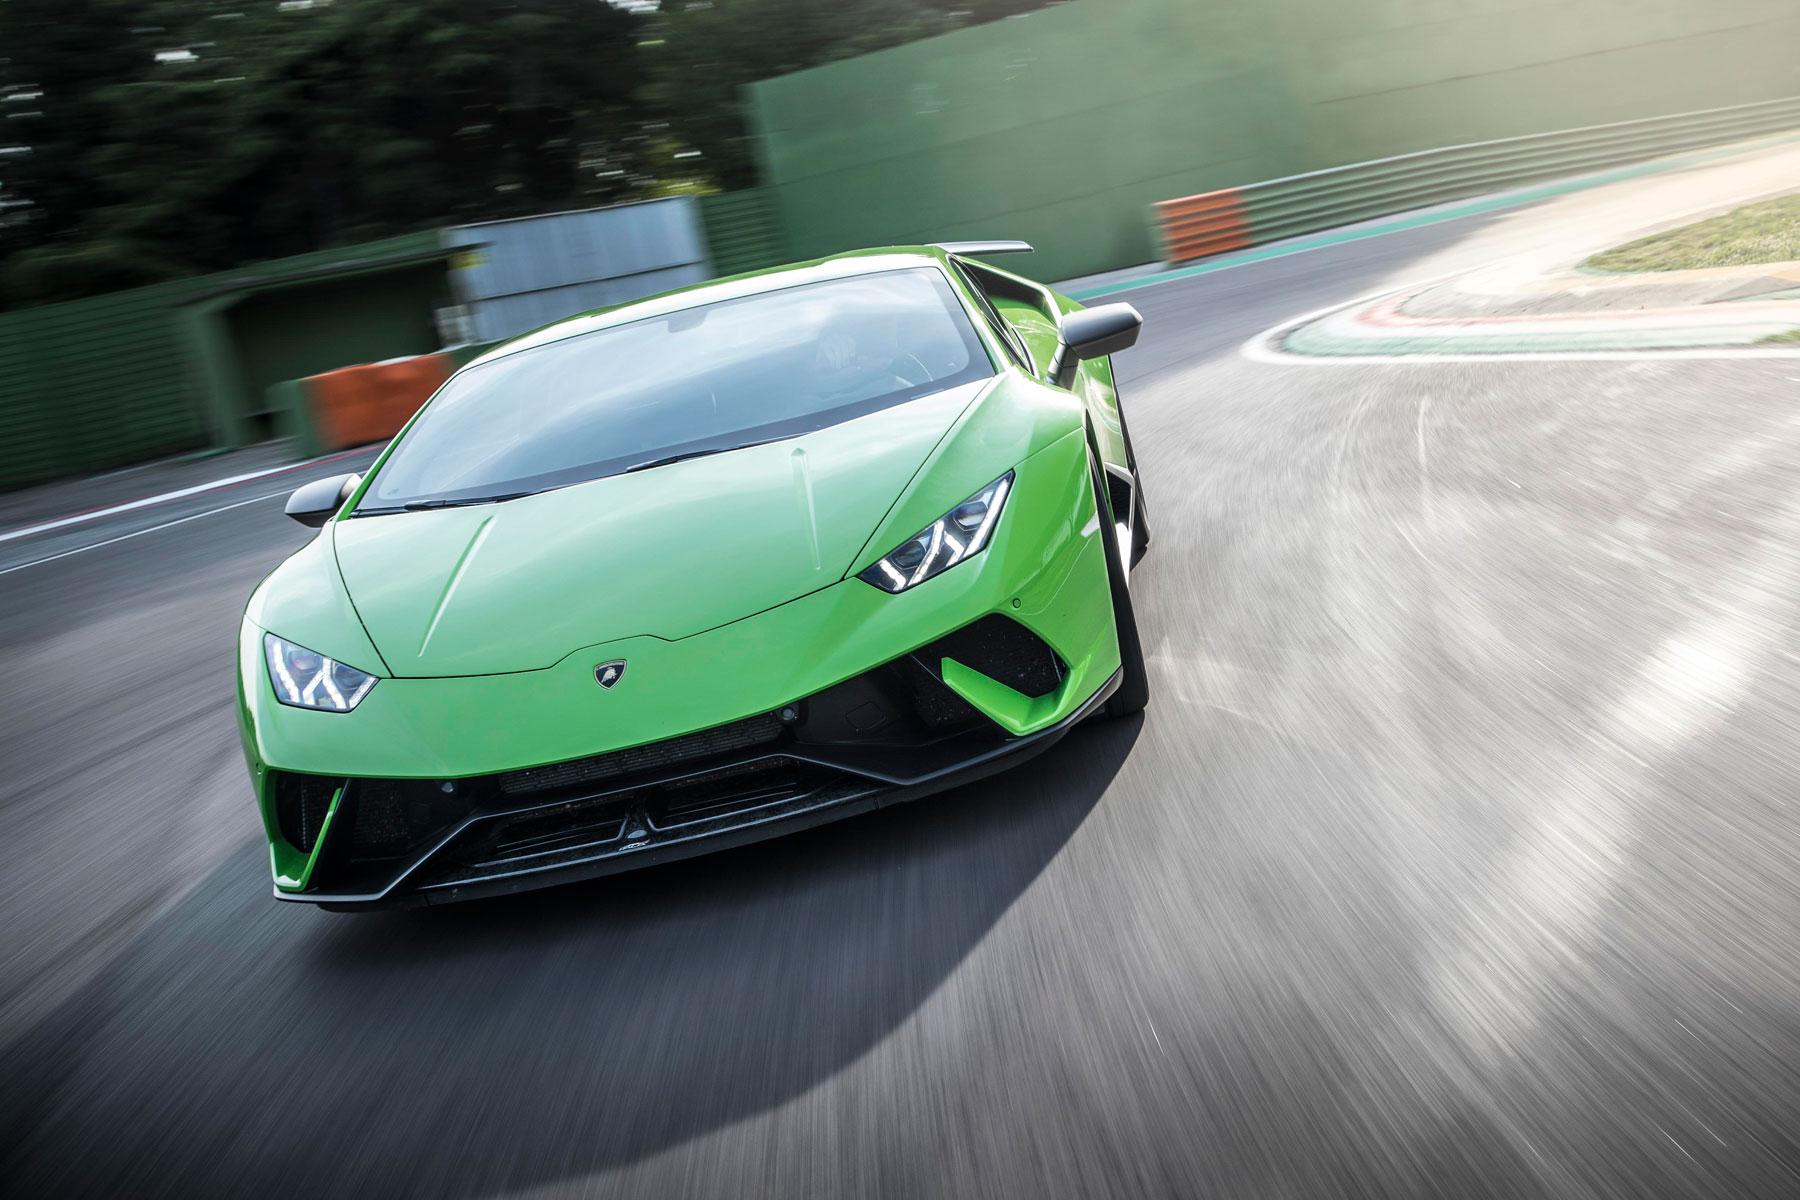 Lamborghini Huracan Performante – 2.9 seconds